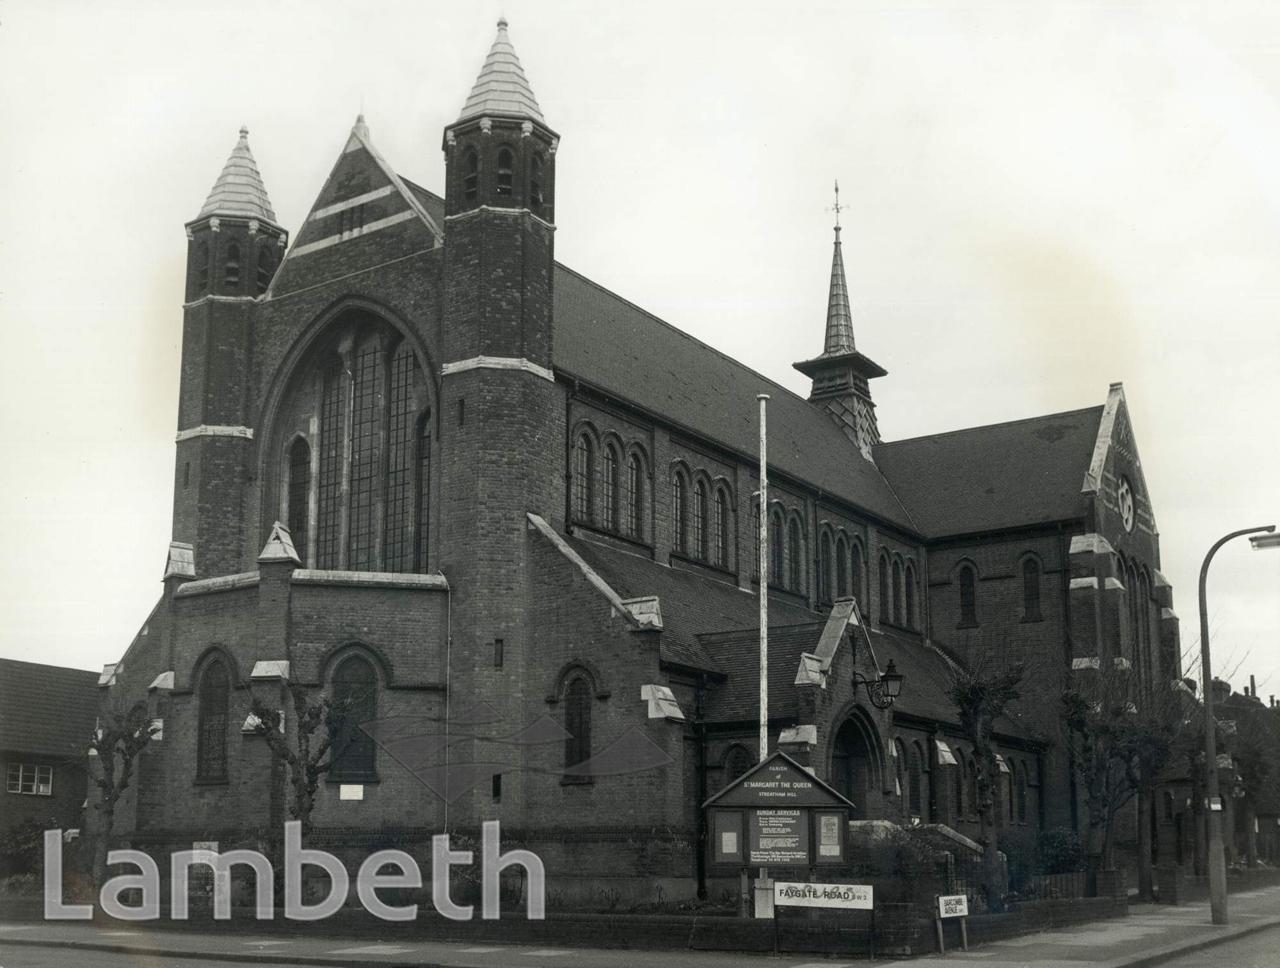 ST MARGARET'S CHURCH, BARCOMBE AVENUE, STREATHAM HILL